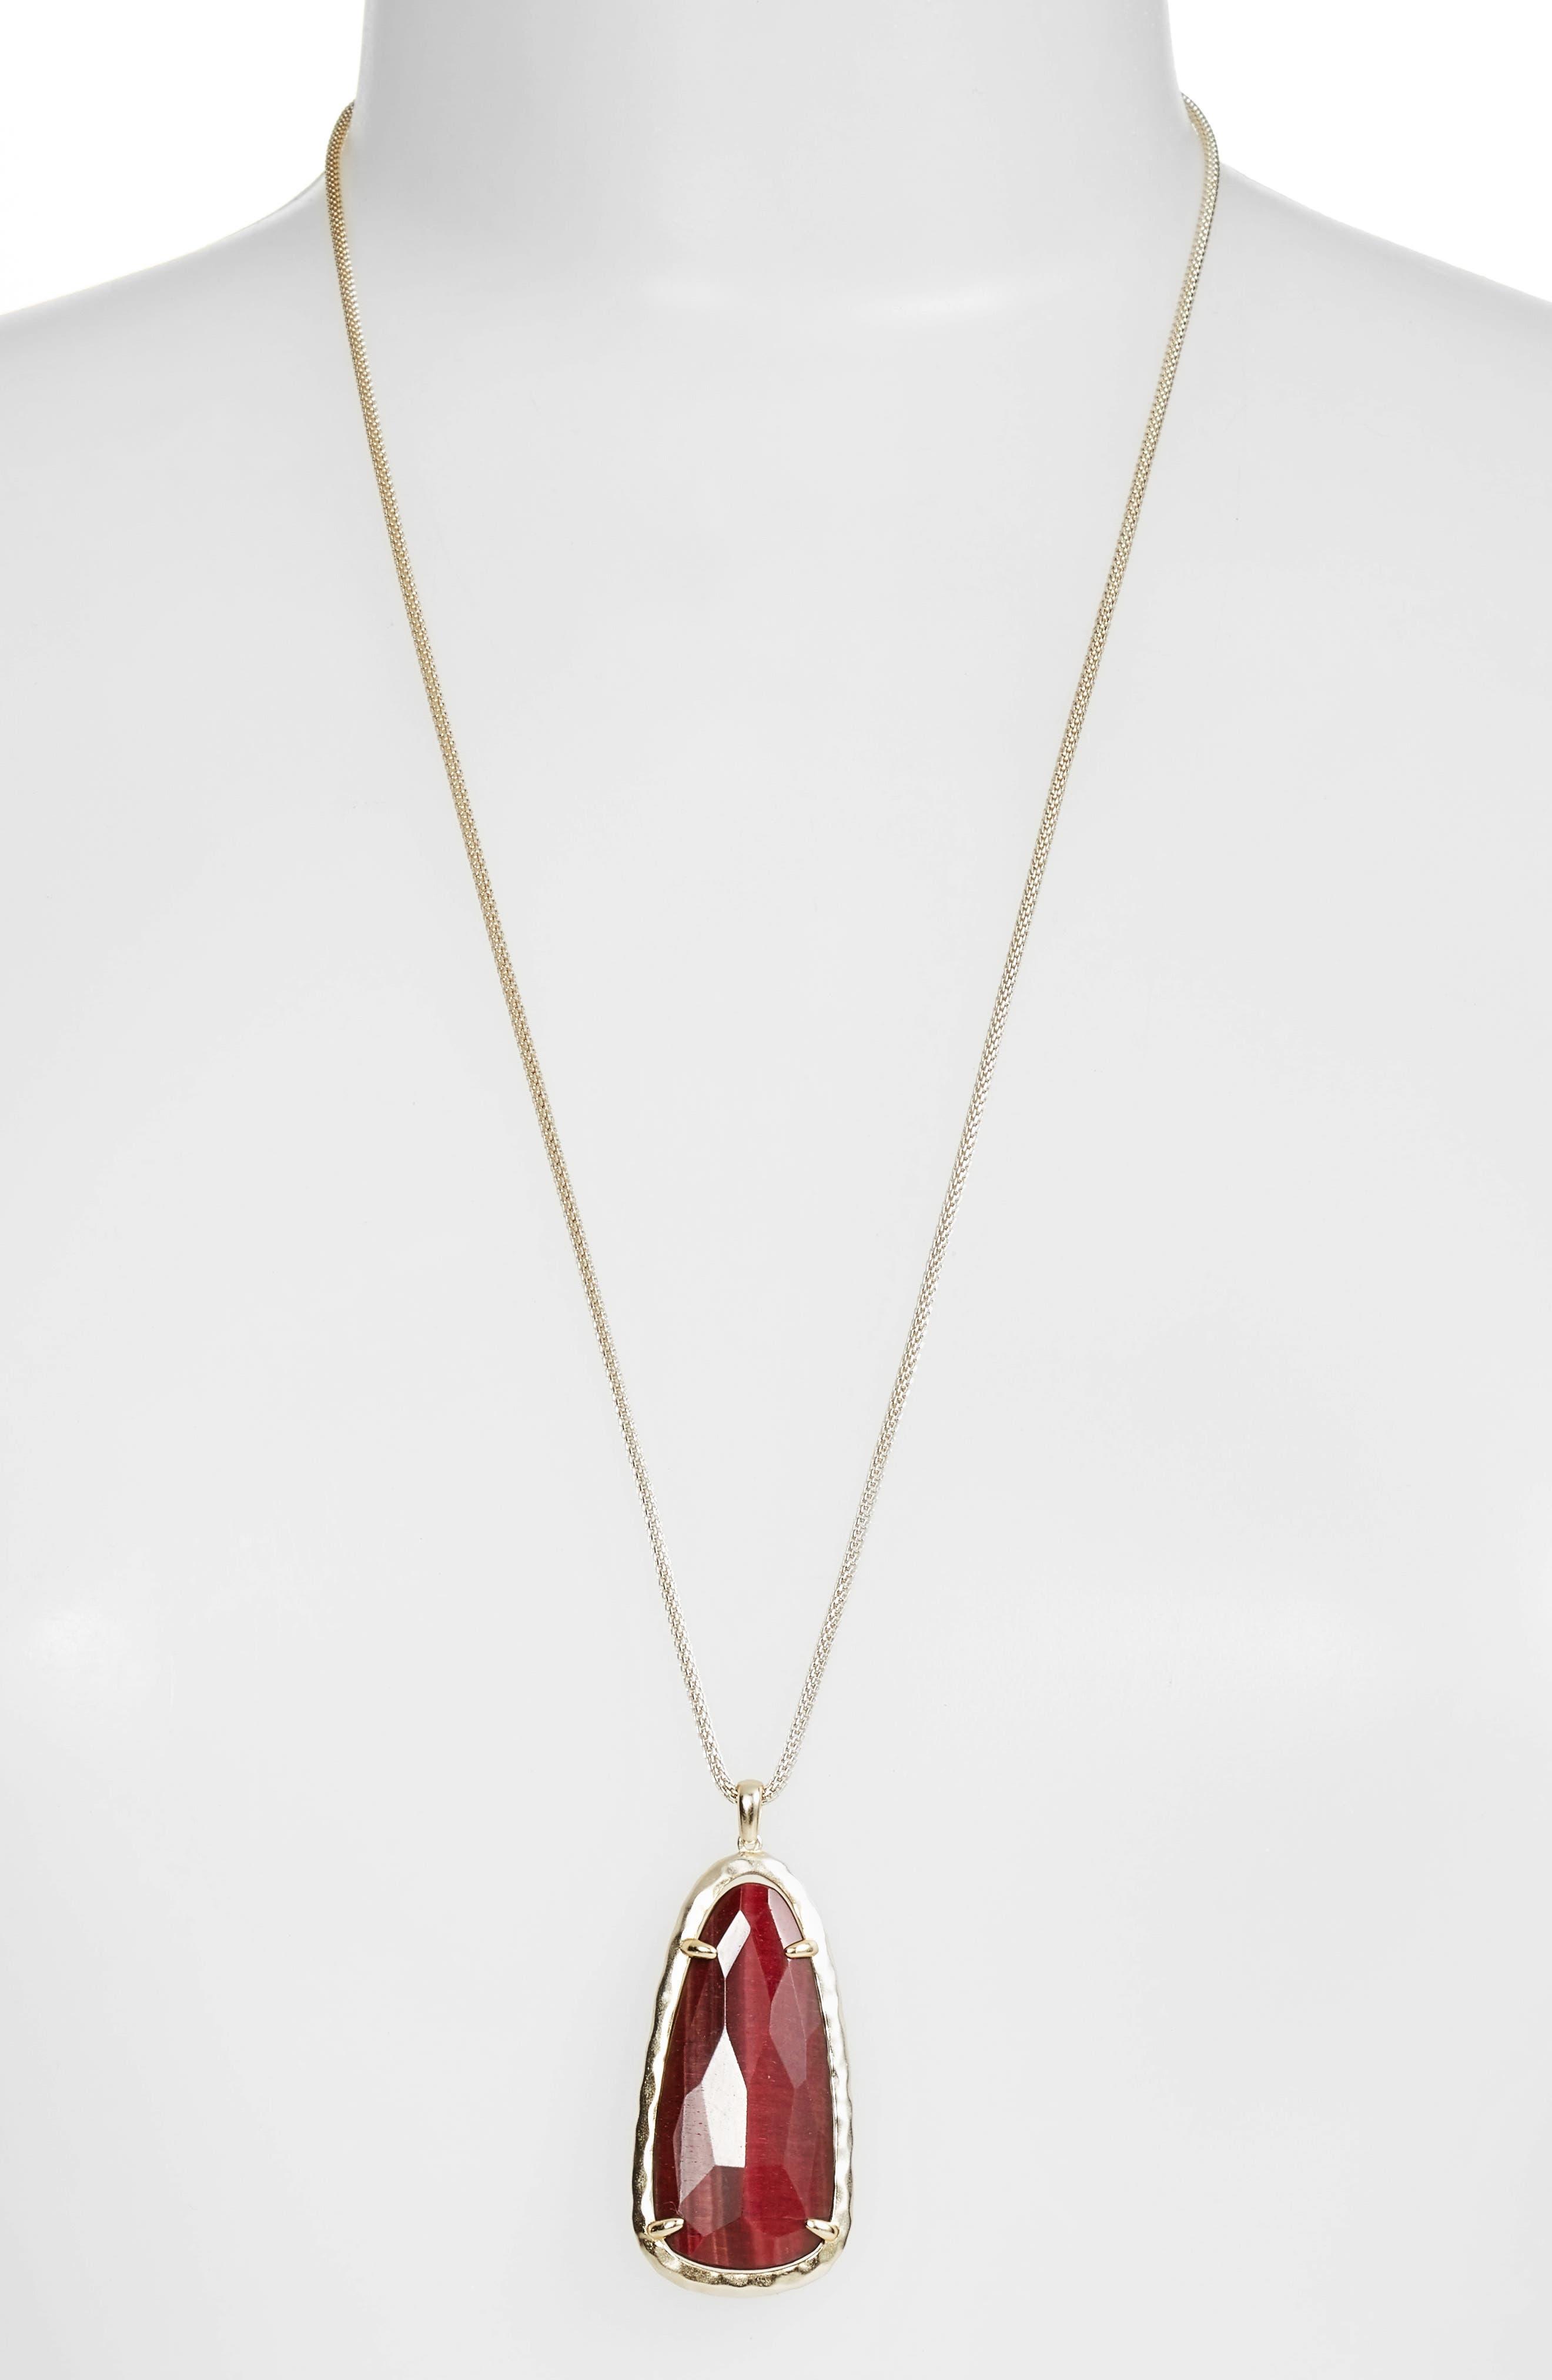 KENDRA SCOTT Saylor Pendant Necklace